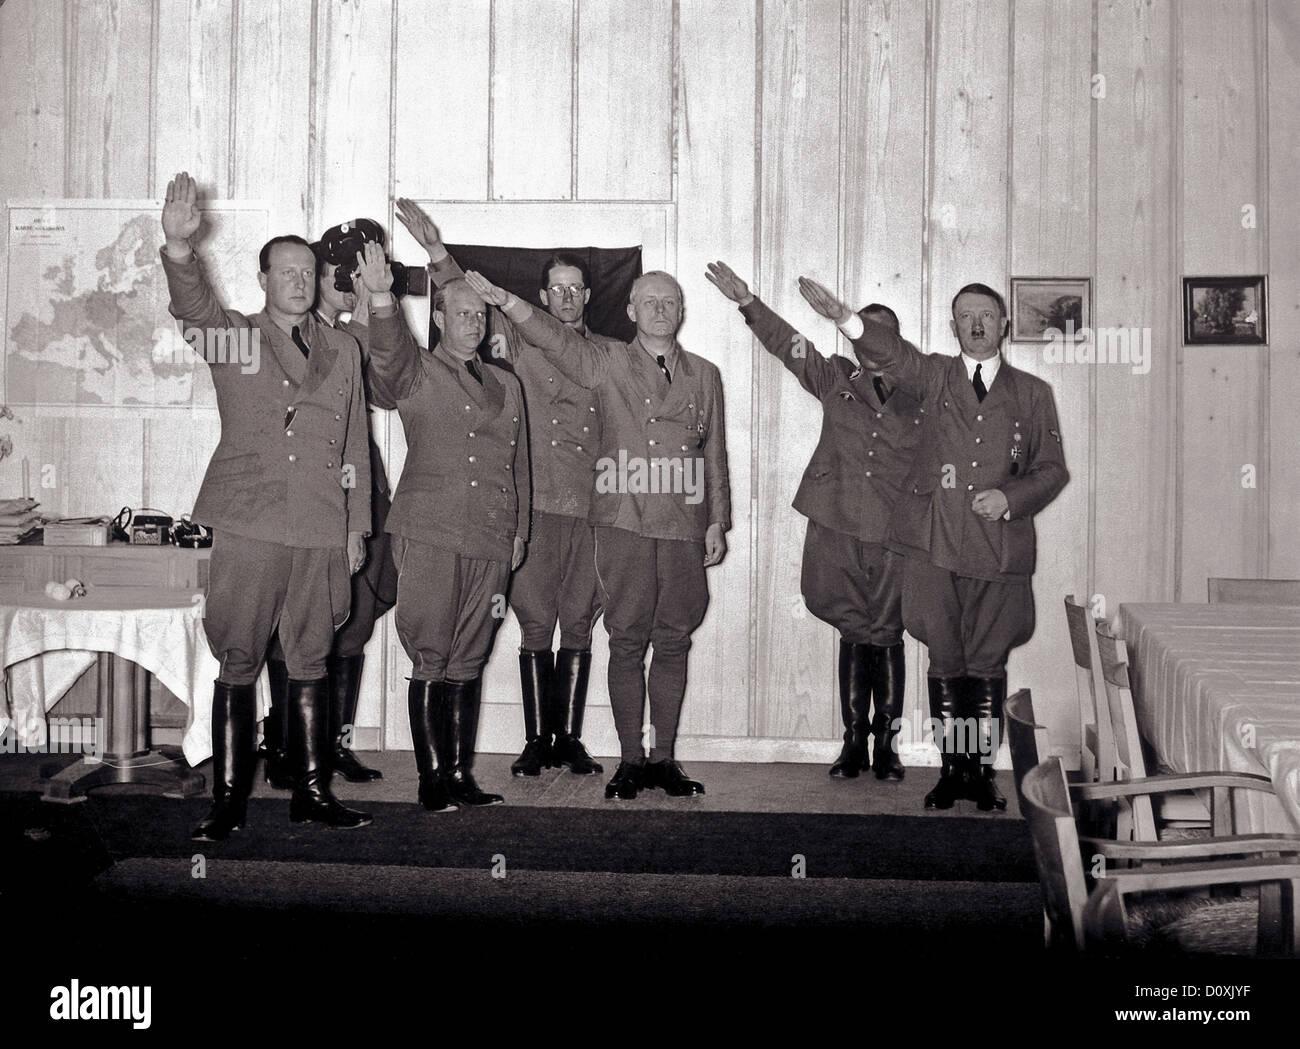 Adolf Hitler, visitors, Berghof, presenting, Nazi, Hitler, salute, Heil Hitler, Fuehrer, Berchtesgaden, Germany, - Stock Image